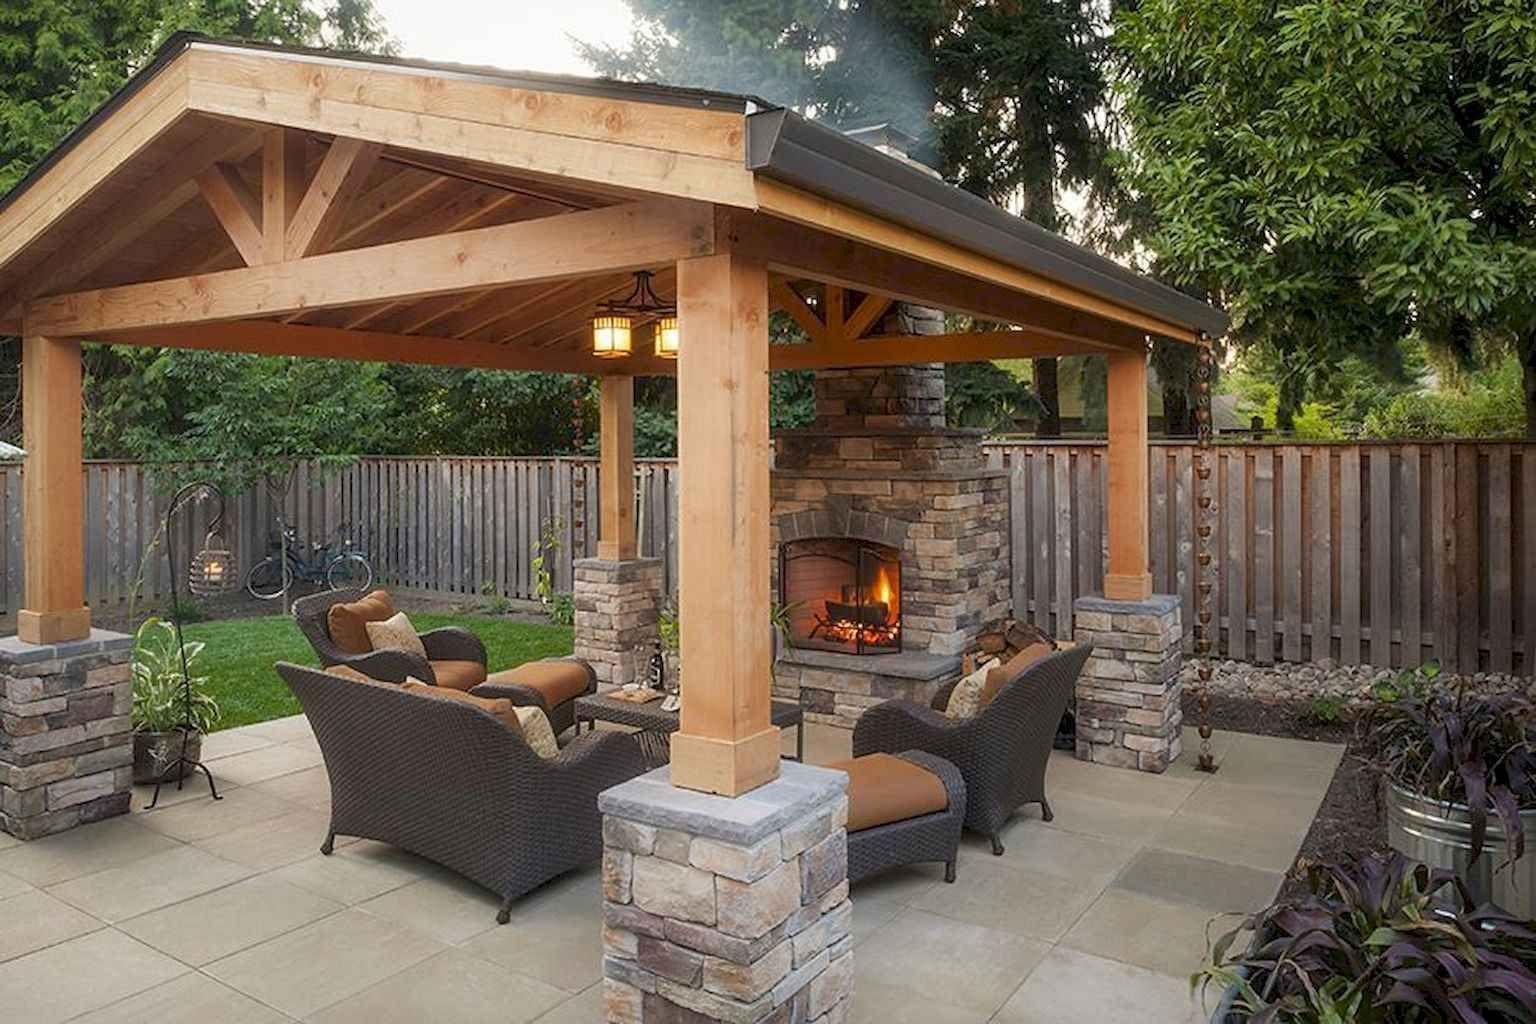 60 Diy Backyard Gazebo Design And Decorating Ideas Backyard